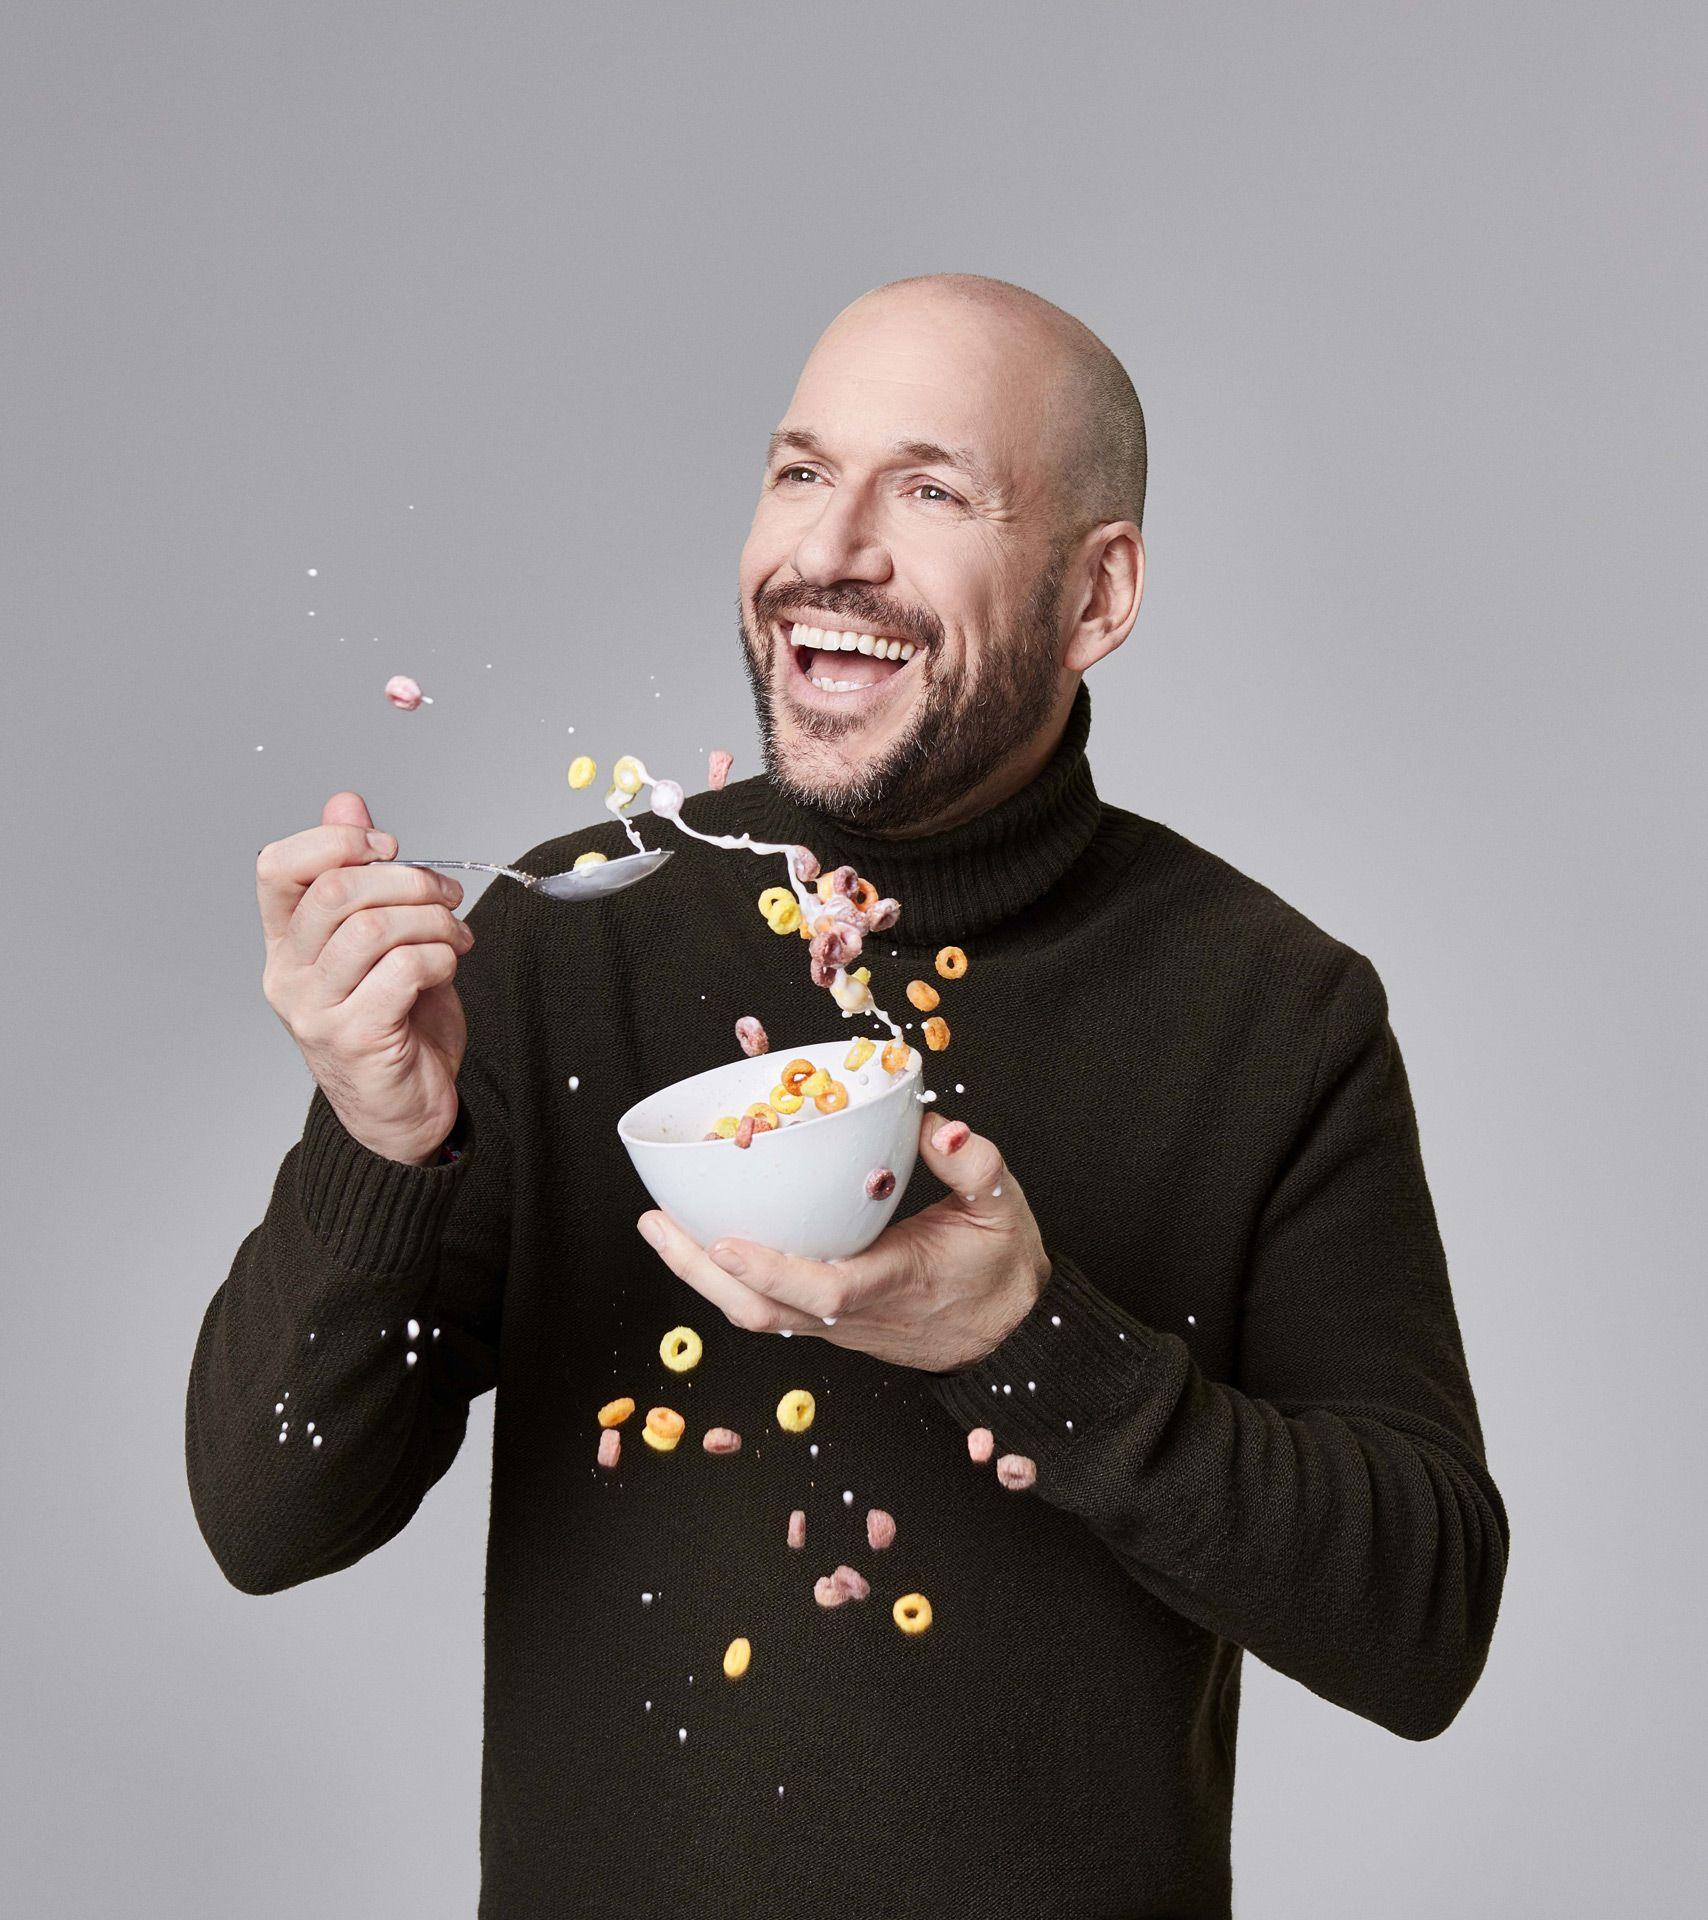 Martin Matte celebrity male portrait huge smile with bowl of fruit loops some cereal flying out by Jocelyn Michel